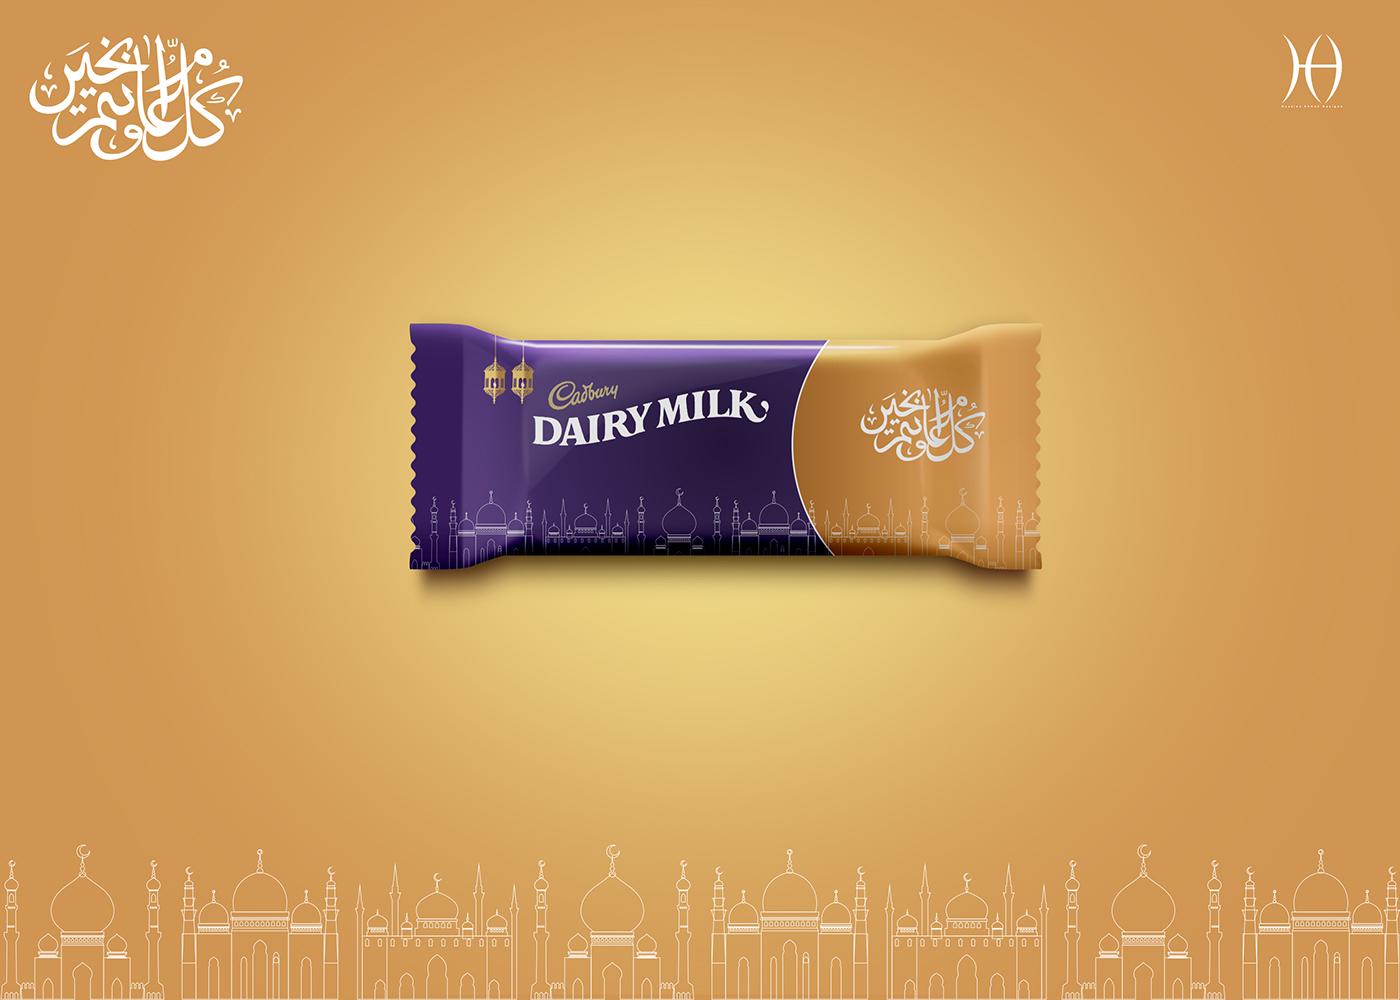 Cadbury Dairy Milk,Cadbury,chocolate,ADV,milk,Dairy,packing,branding